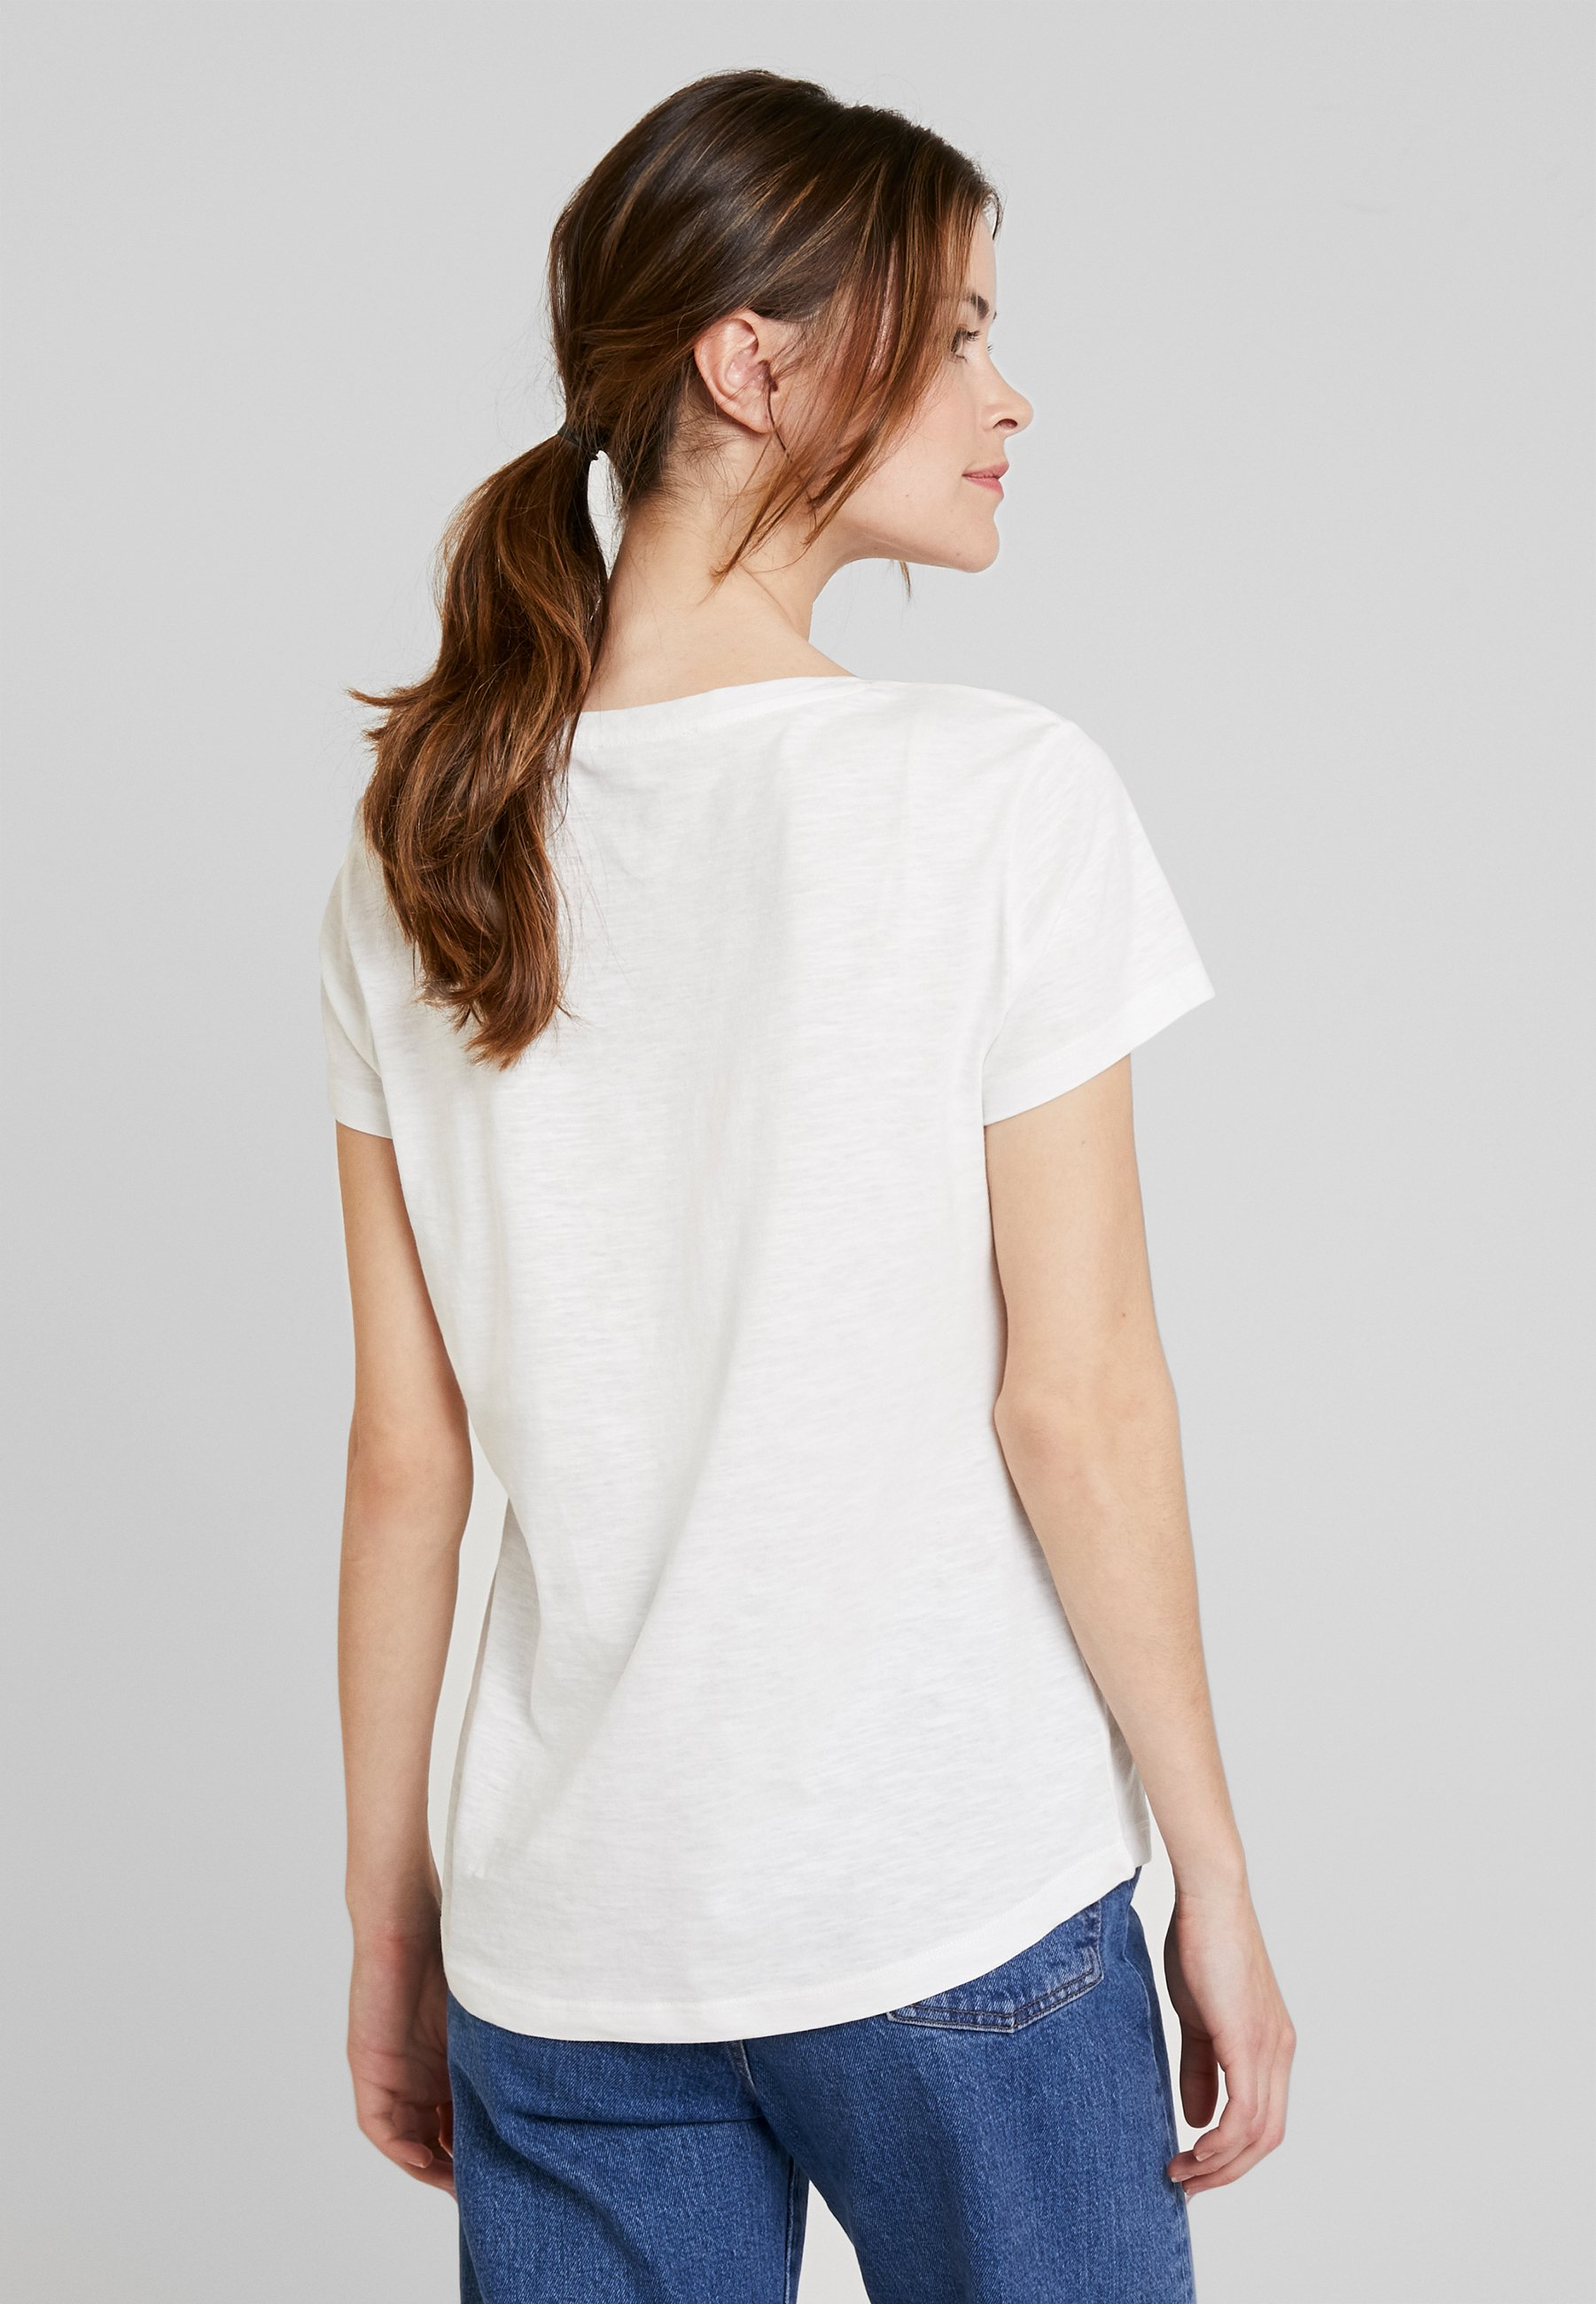 Slub Off shirt Imprimé Tom Denim TeeT Tailor White NPk80wnOX